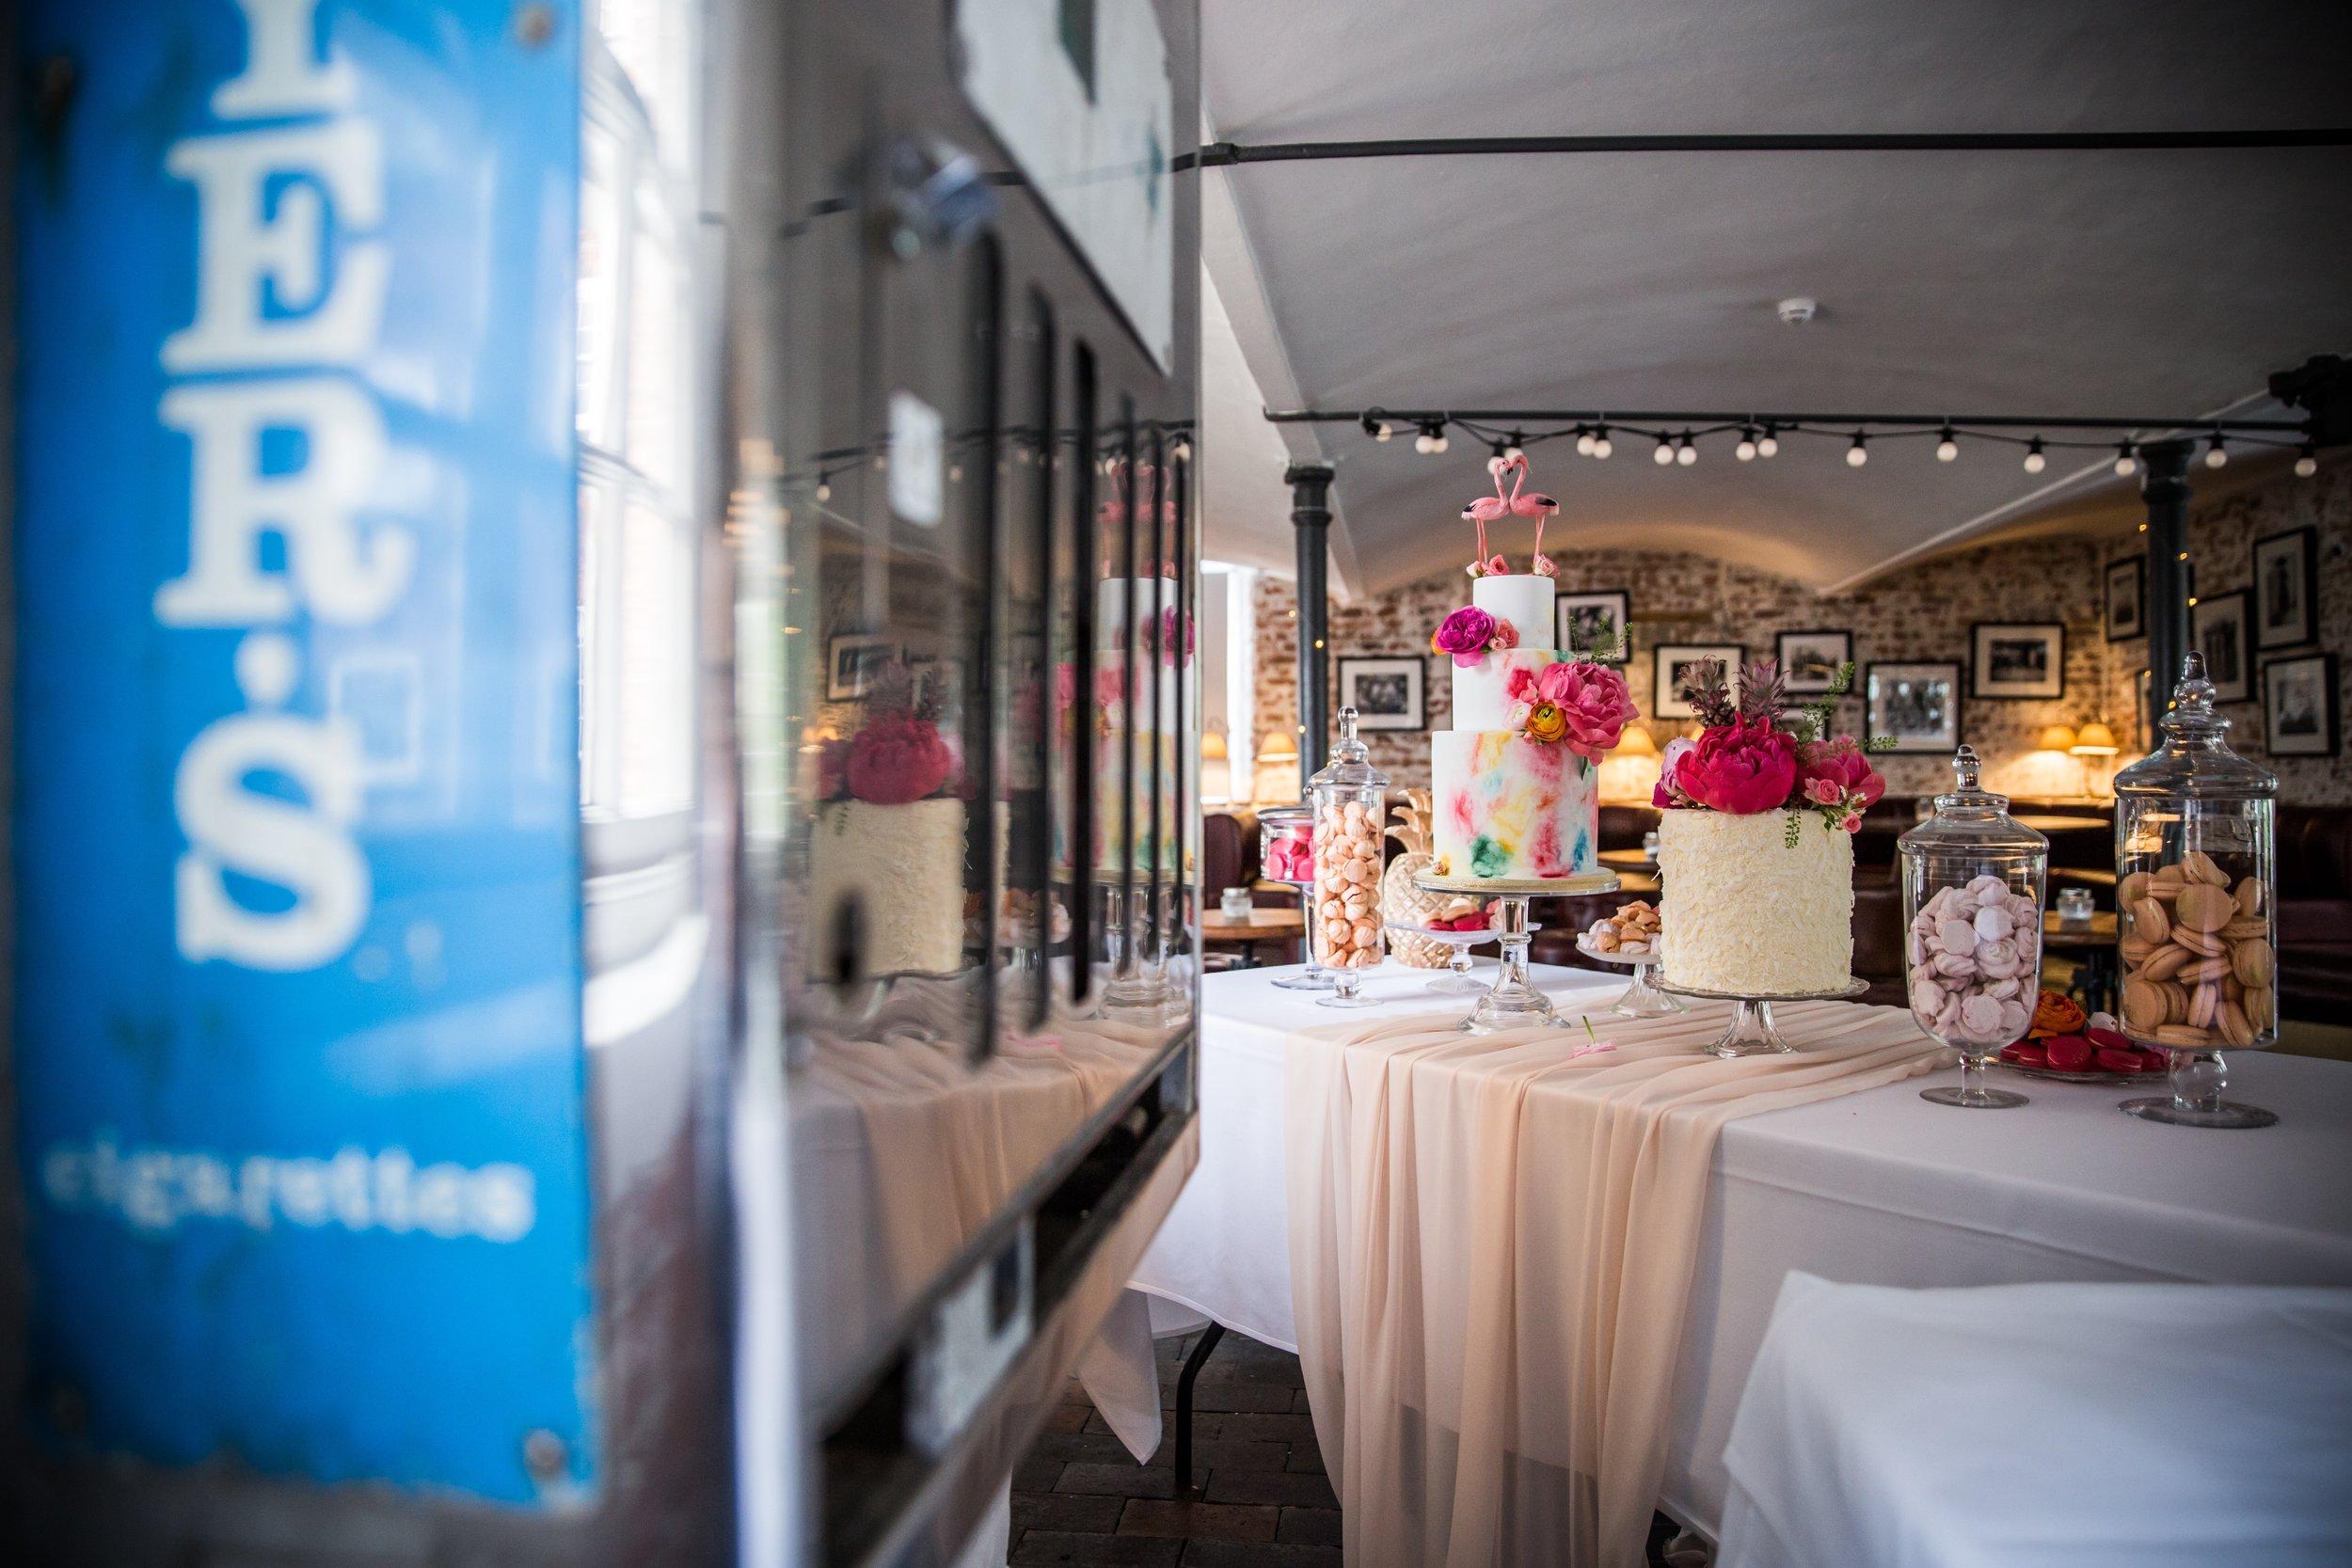 {Real Wedding Gallery: Heather & Chris}Creative & Unique Wedding Cakes | Yummy Little Cakes - Nottingham | www.yummylittlecakes.co.uk